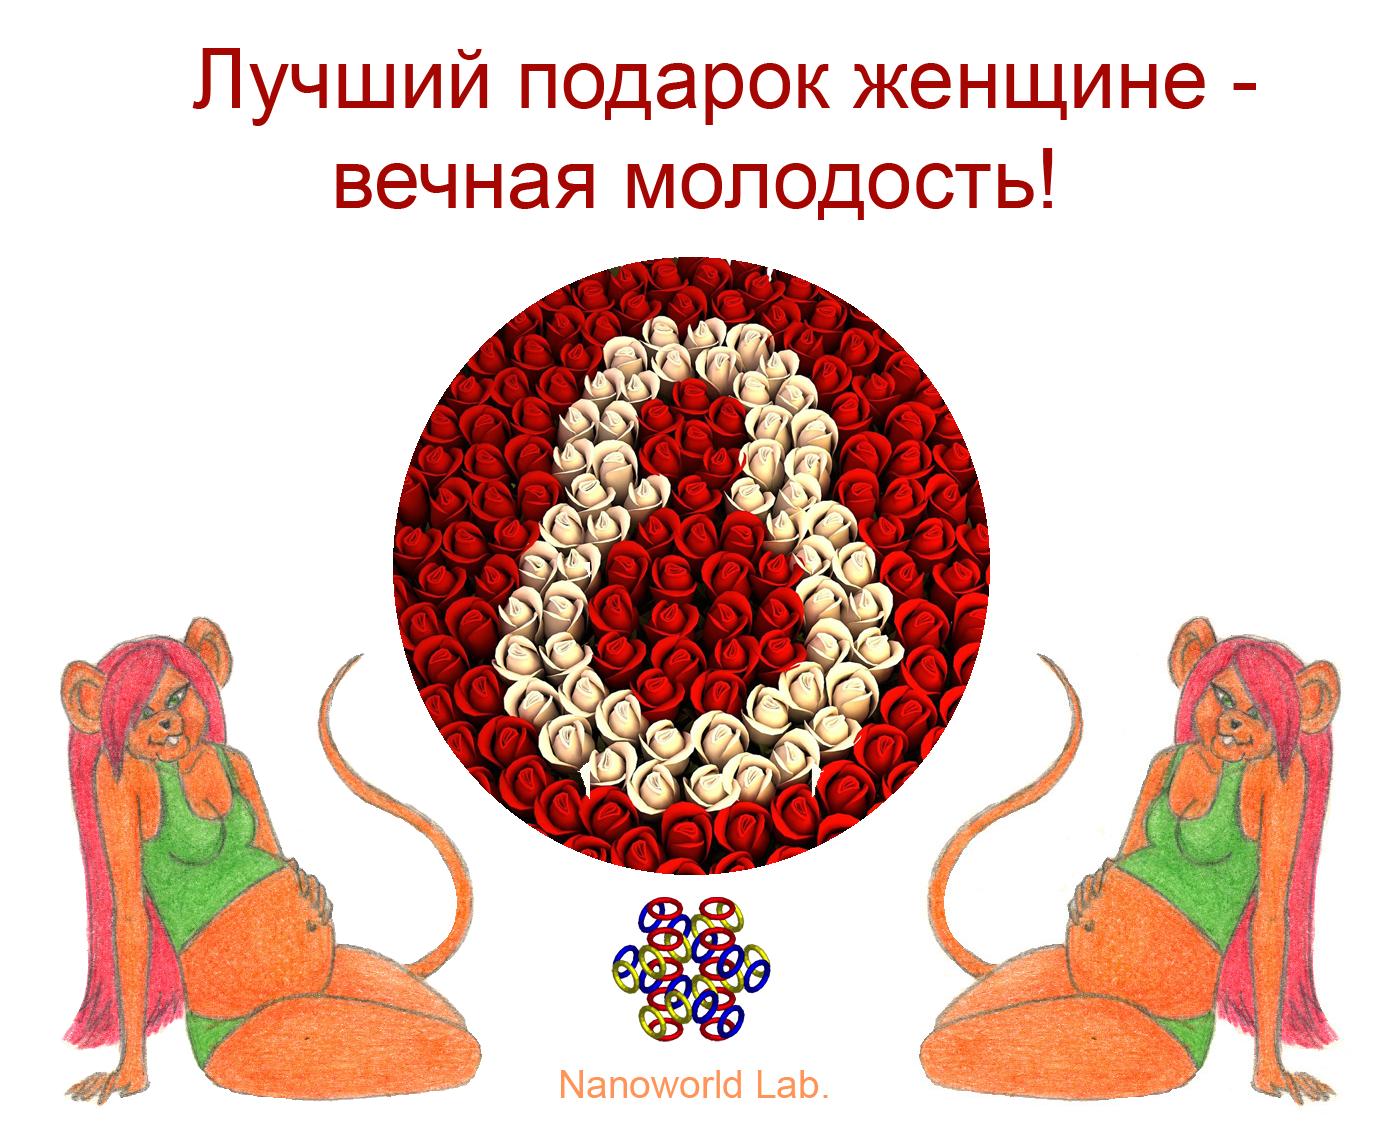 http://img-fotki.yandex.ru/get/6200/126580004.49/0_b6b05_171832ad_orig.png